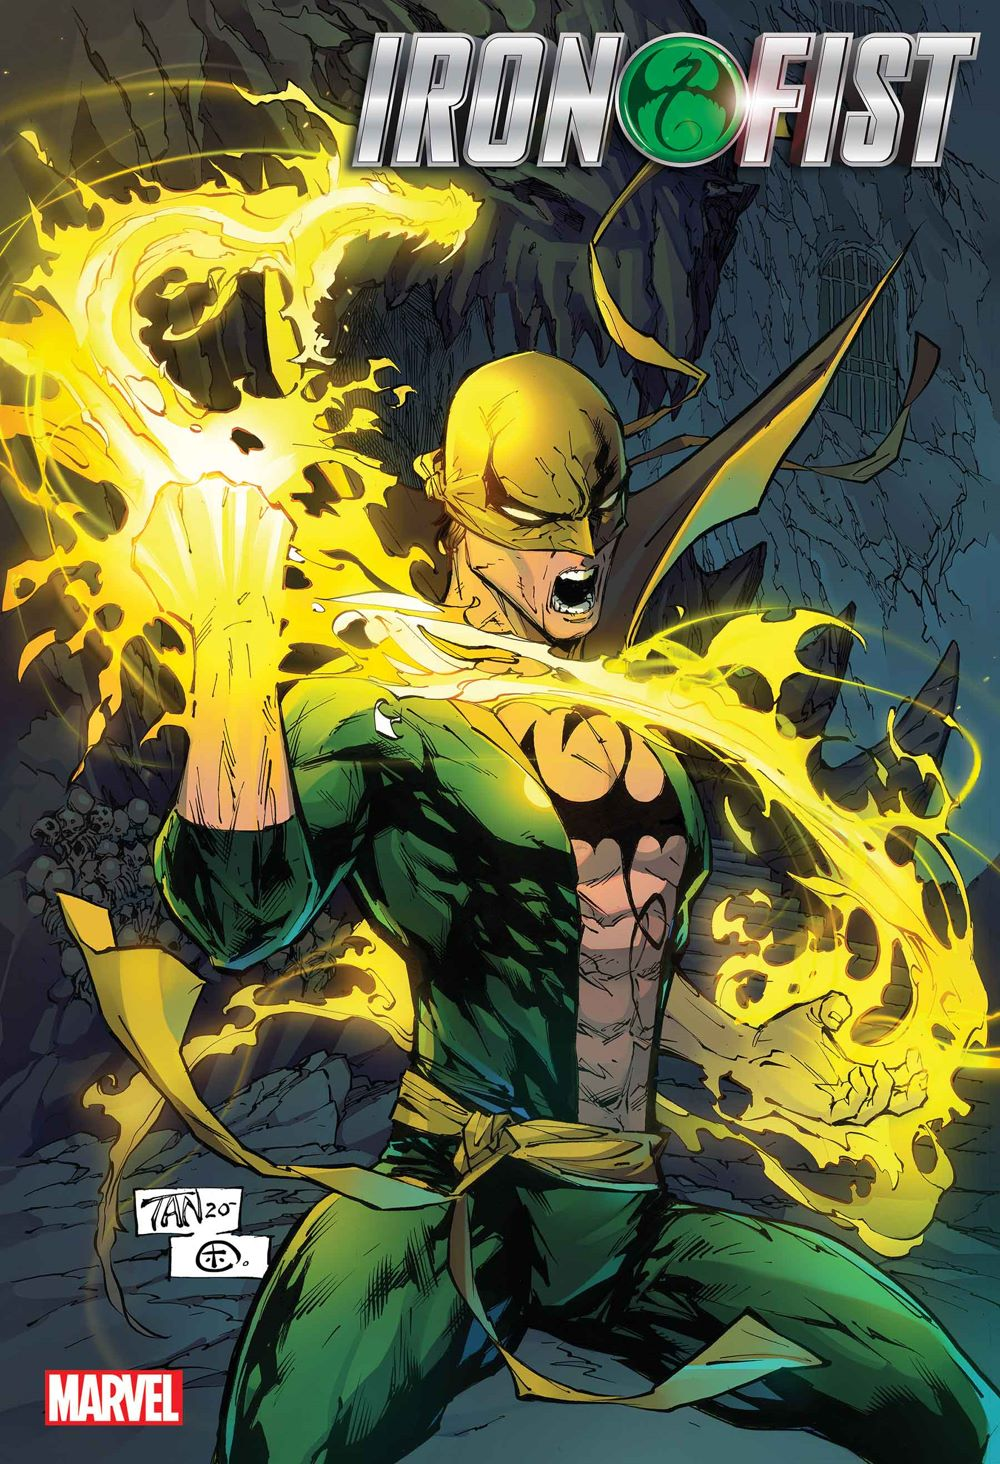 IRONFIST8KING2020001_Cov Marvel Comics January 2021 Solicitations